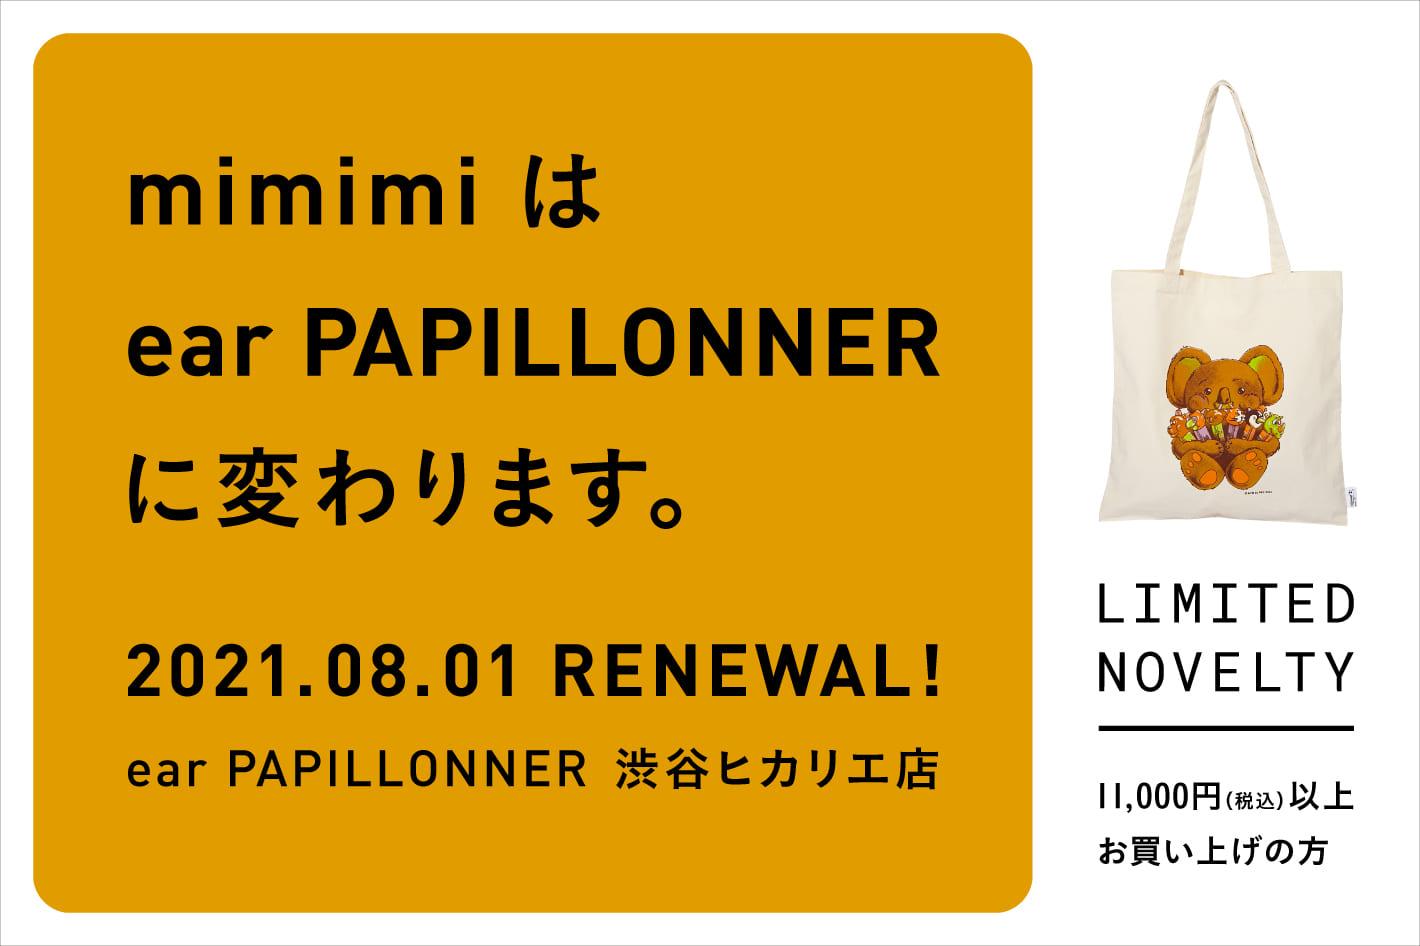 ear PAPILLONNER 2021.8.1 渋谷ヒカリエ店 RENEWAL!